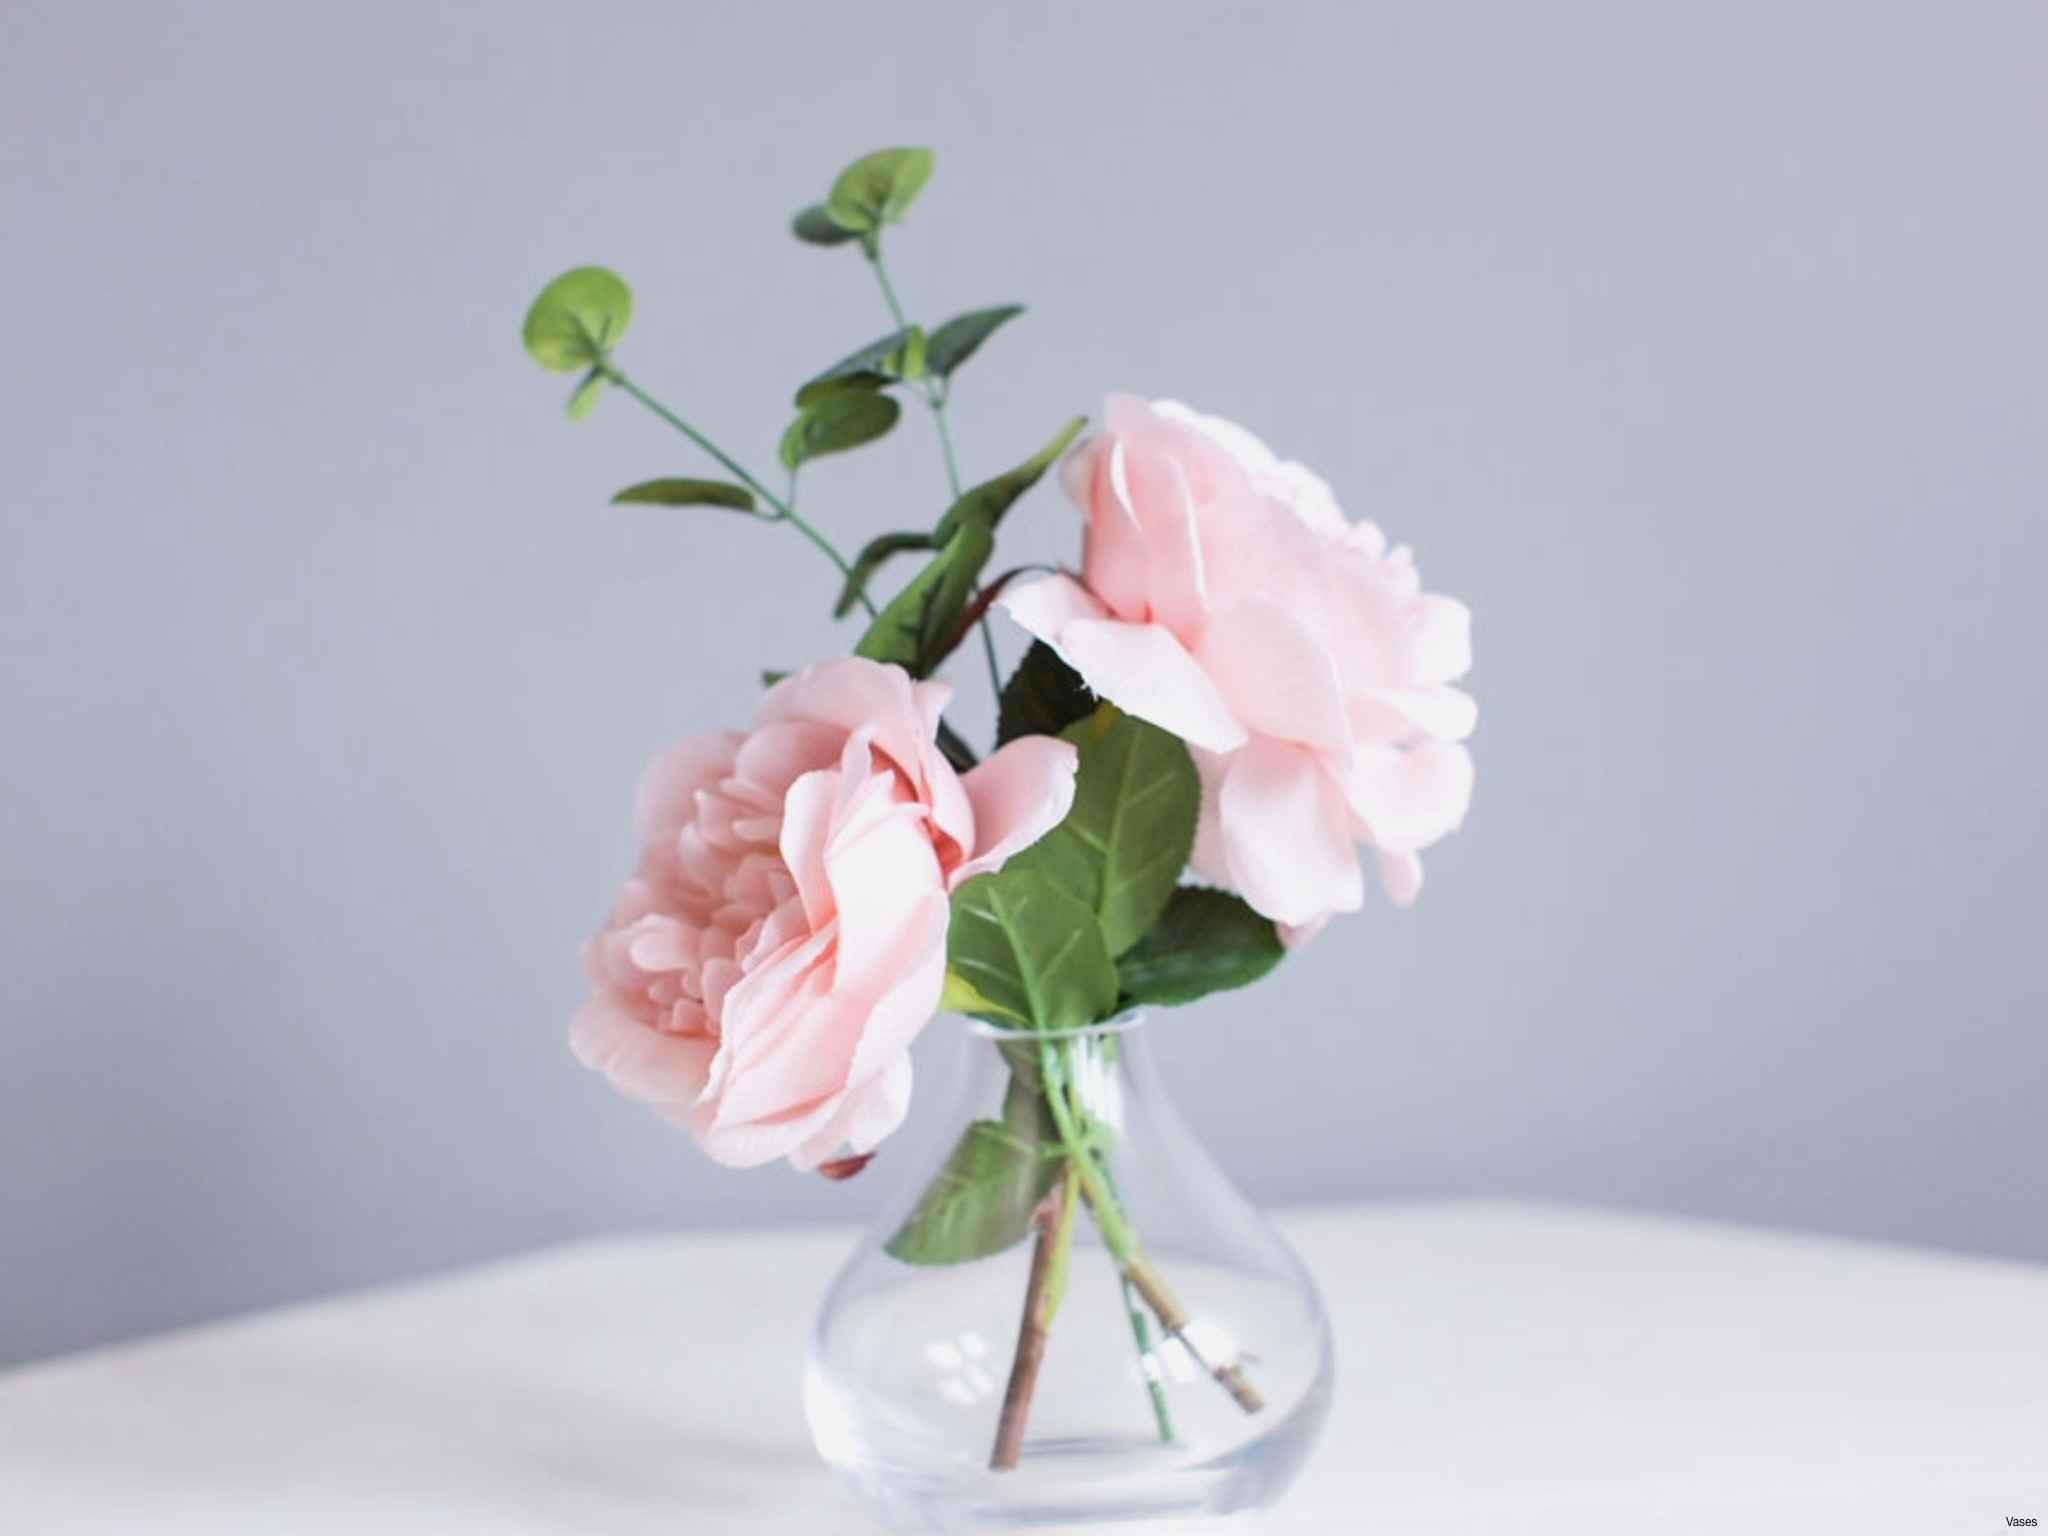 bulk vases dollar tree of elegant fall wedding bouquet wedding theme with silk flower wedding ideas h vases bud vase flower arrangements i 0d for inspiration design inspiration